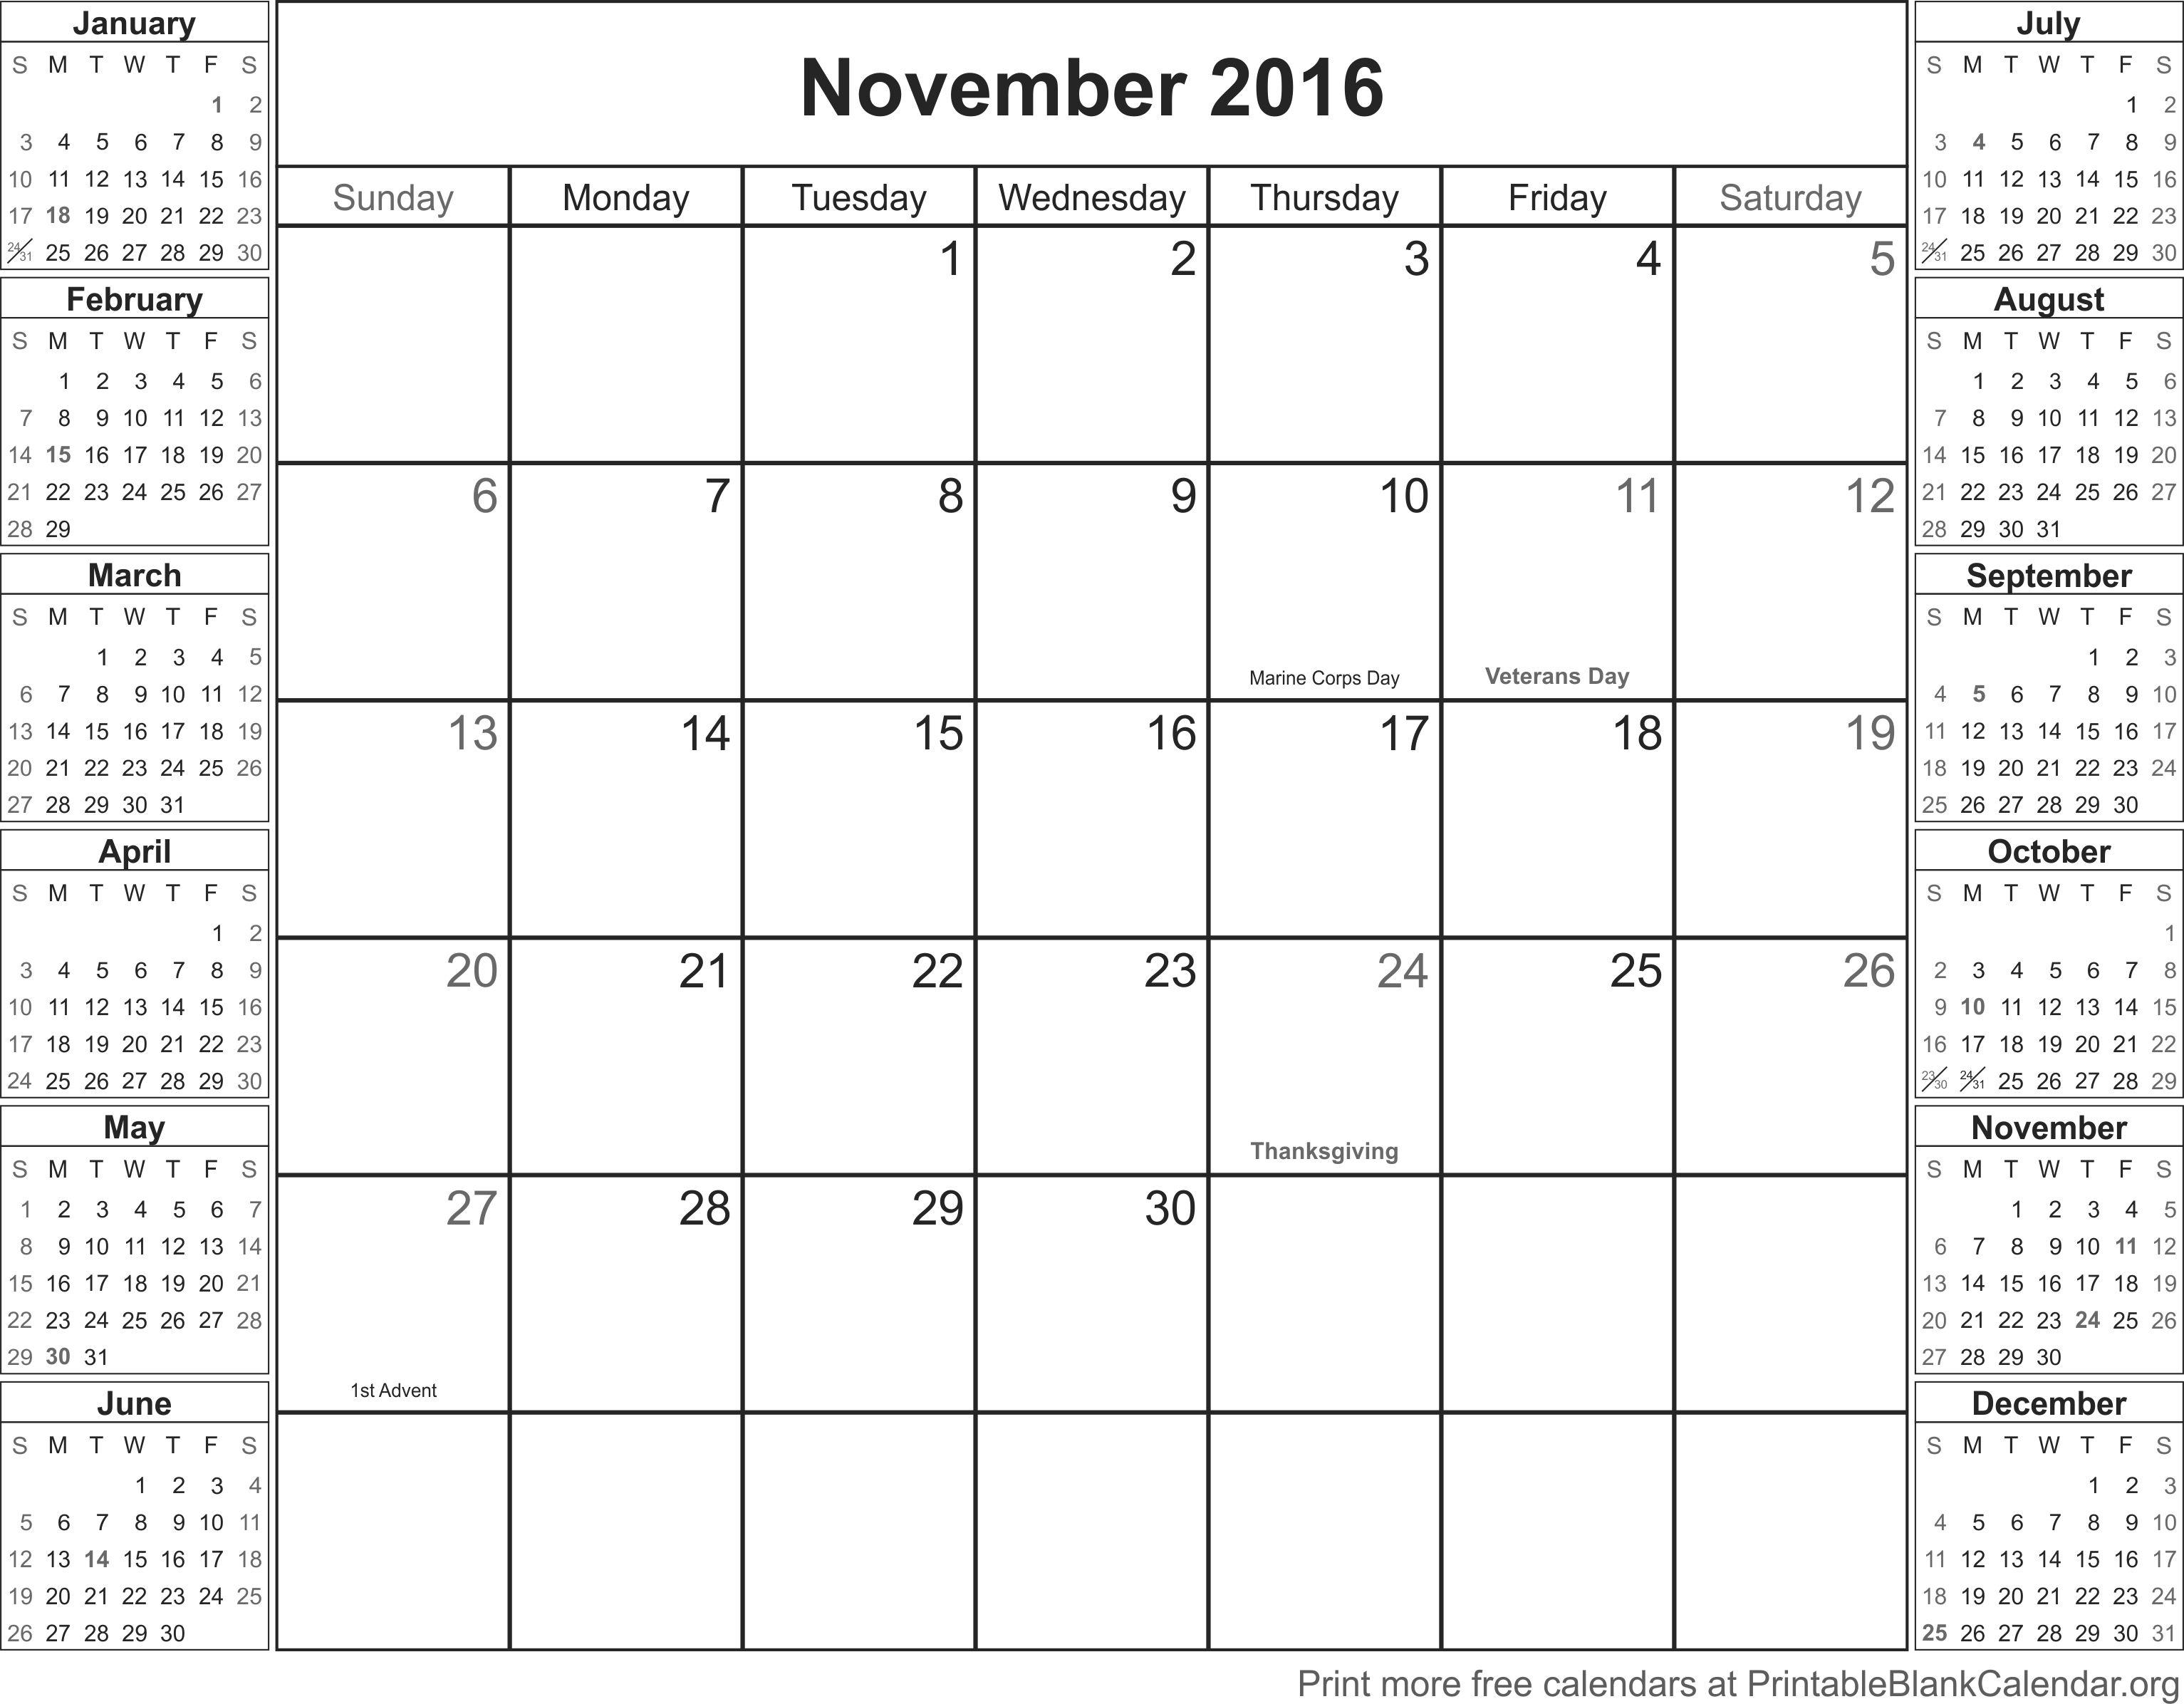 November 2016 Printable Blank Calendar